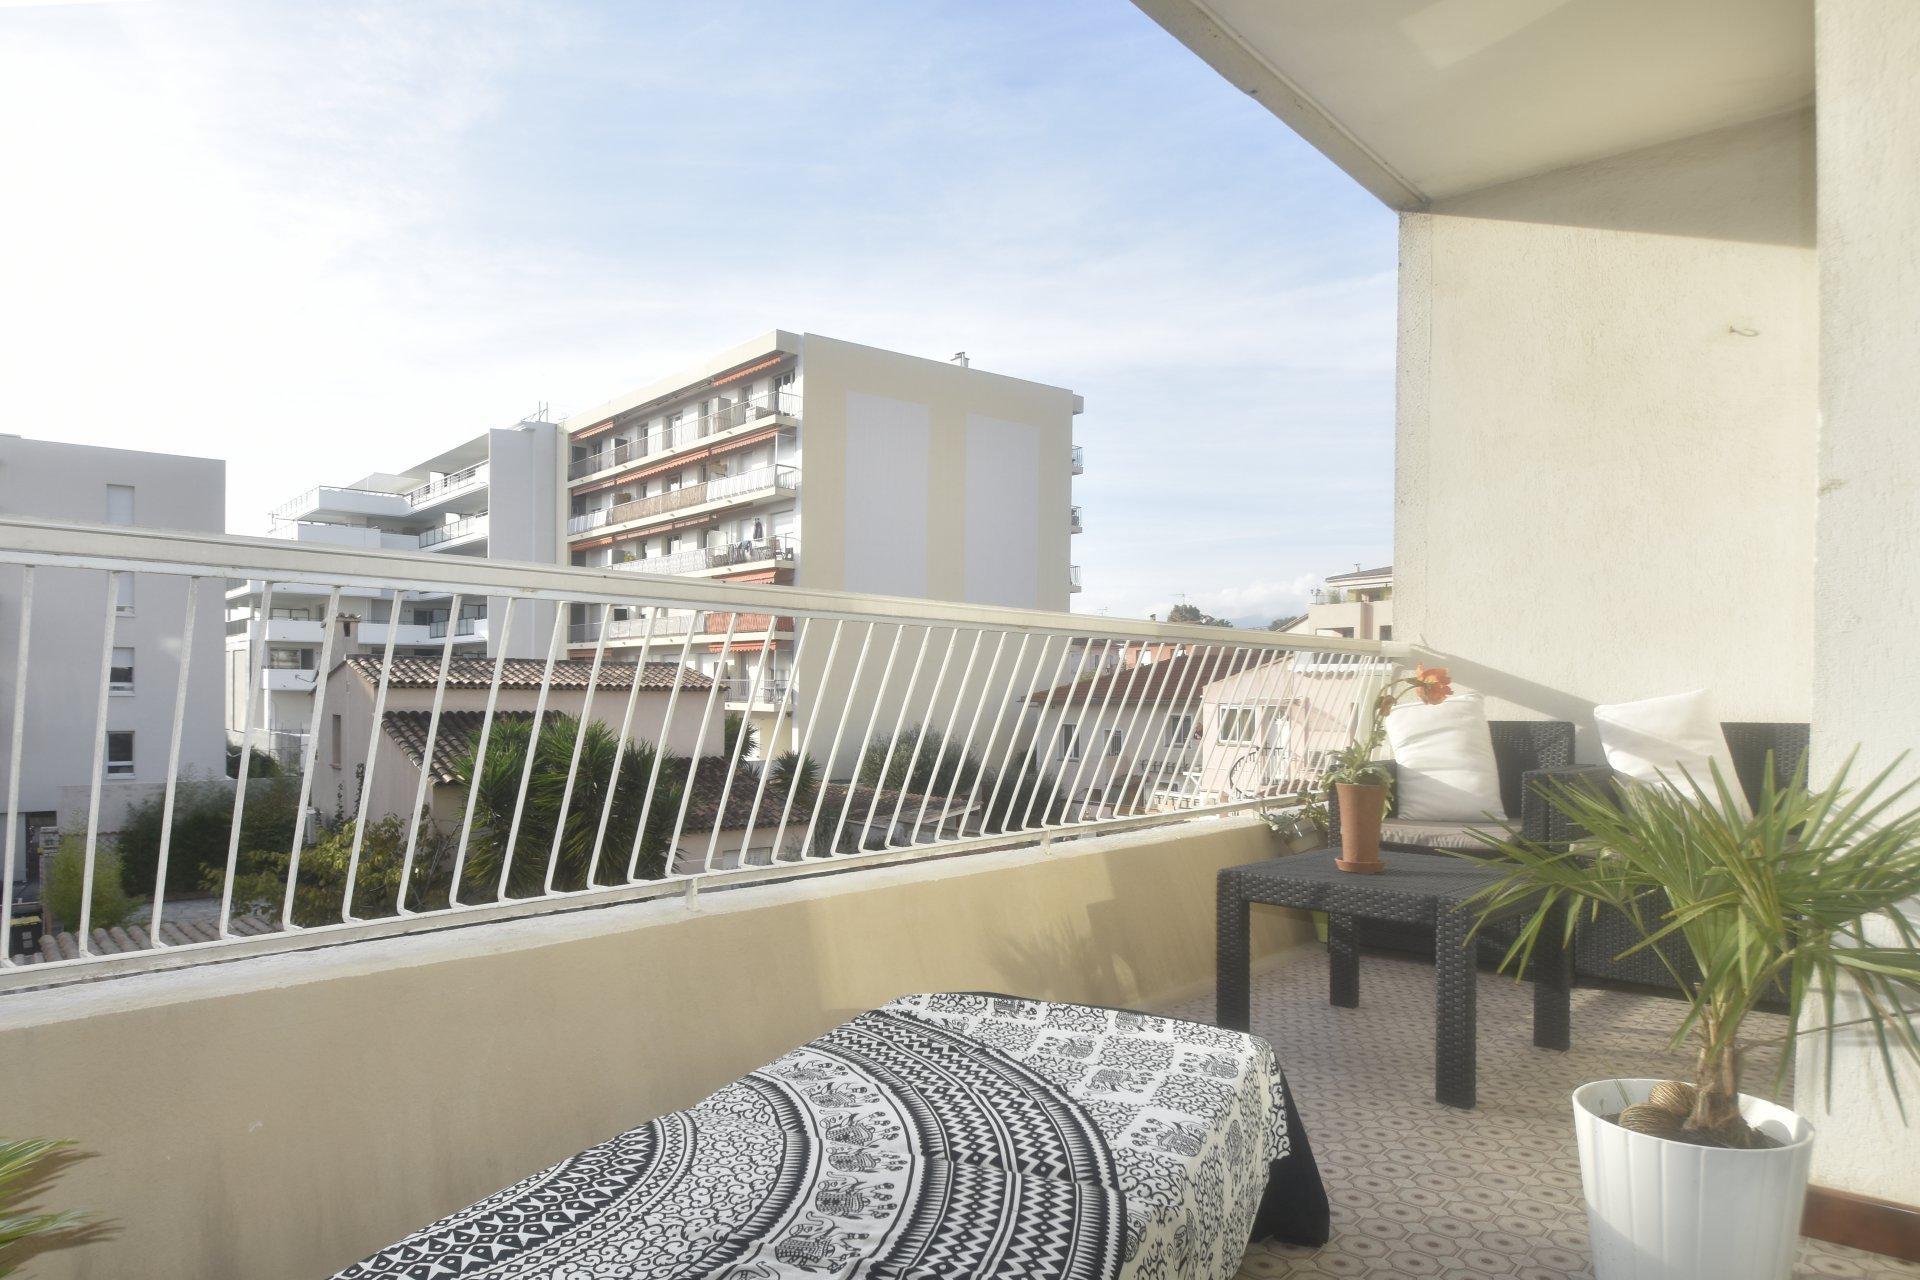 Cros de Cagnes sur Mer : 1 bedrom terrace